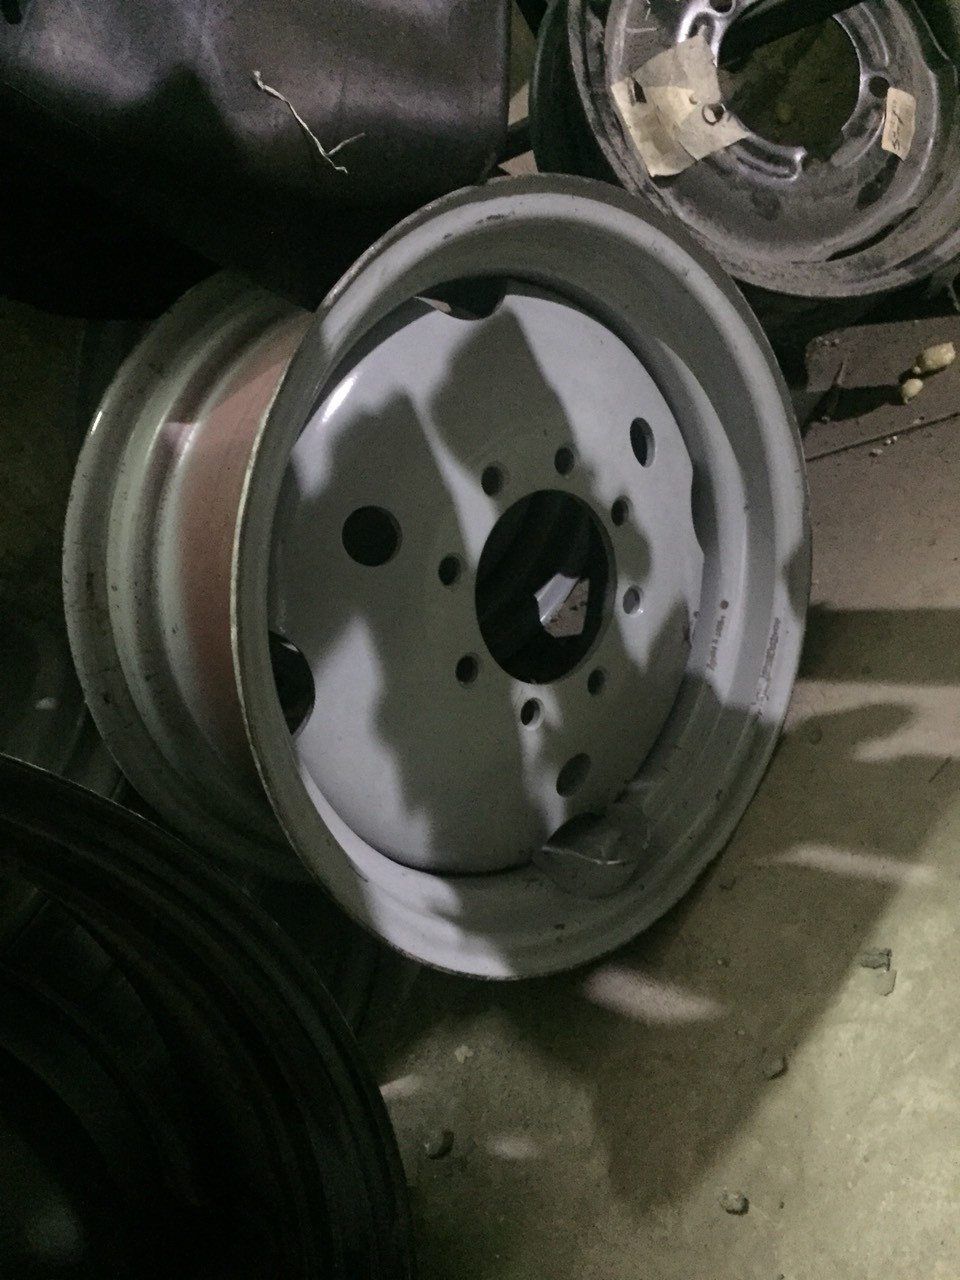 Диск колеса передний широкий 8 отверстий на шину 11,2-20 МТЗ  (БЗТДиА), фото 1